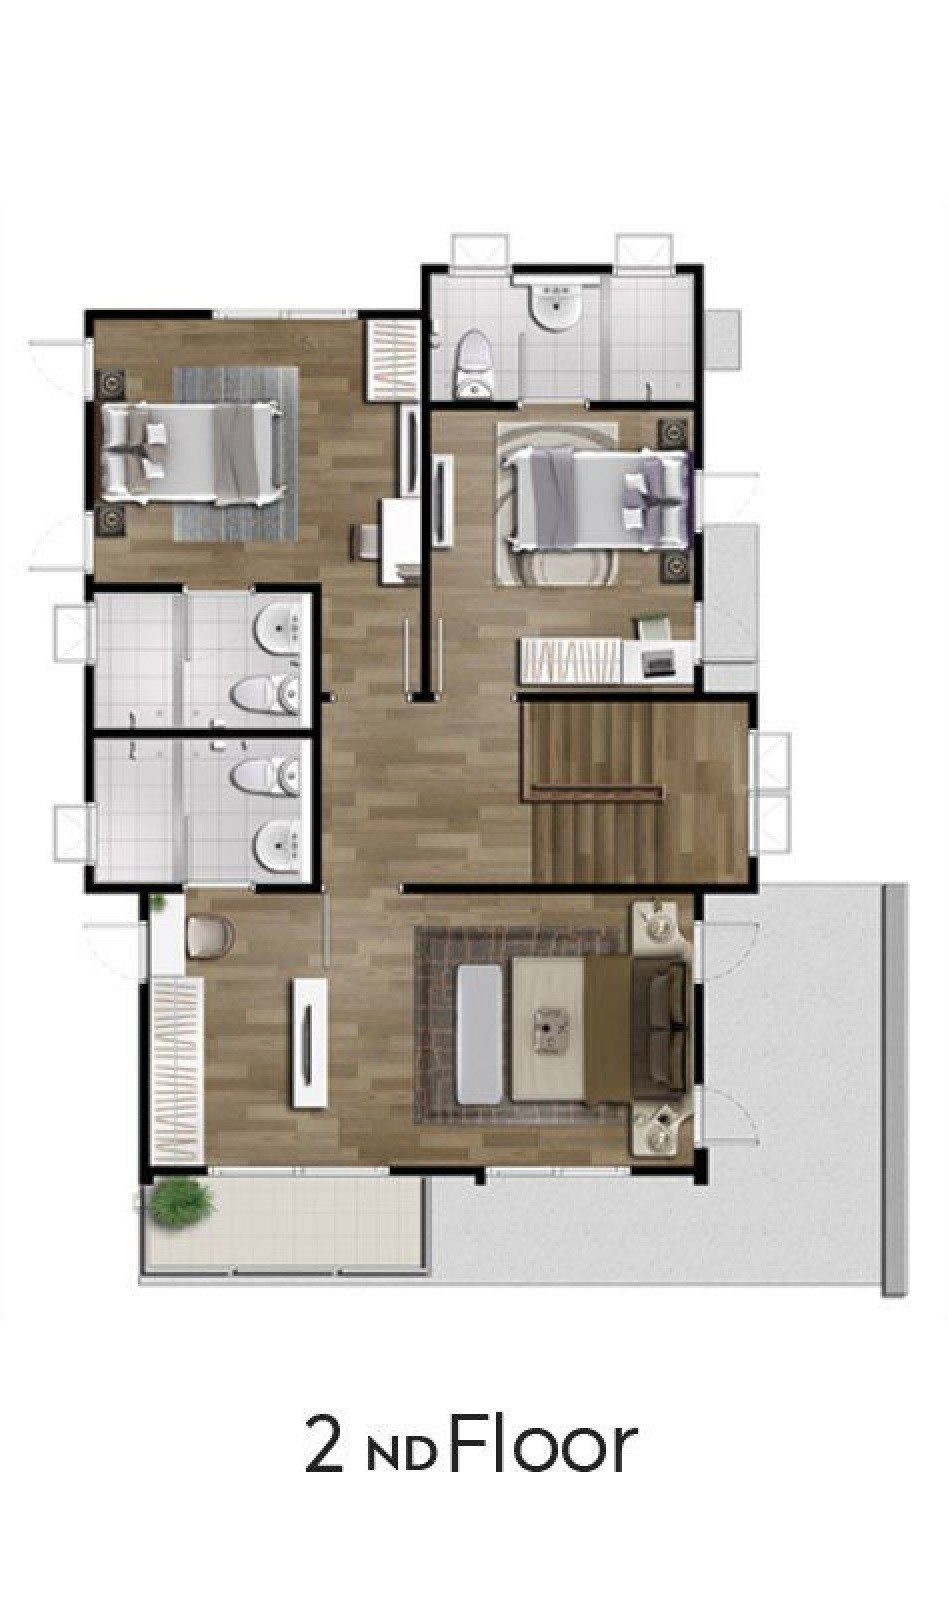 2 Storey Single Detached House 164 Sq M Home Ideas Detached House House House Plans